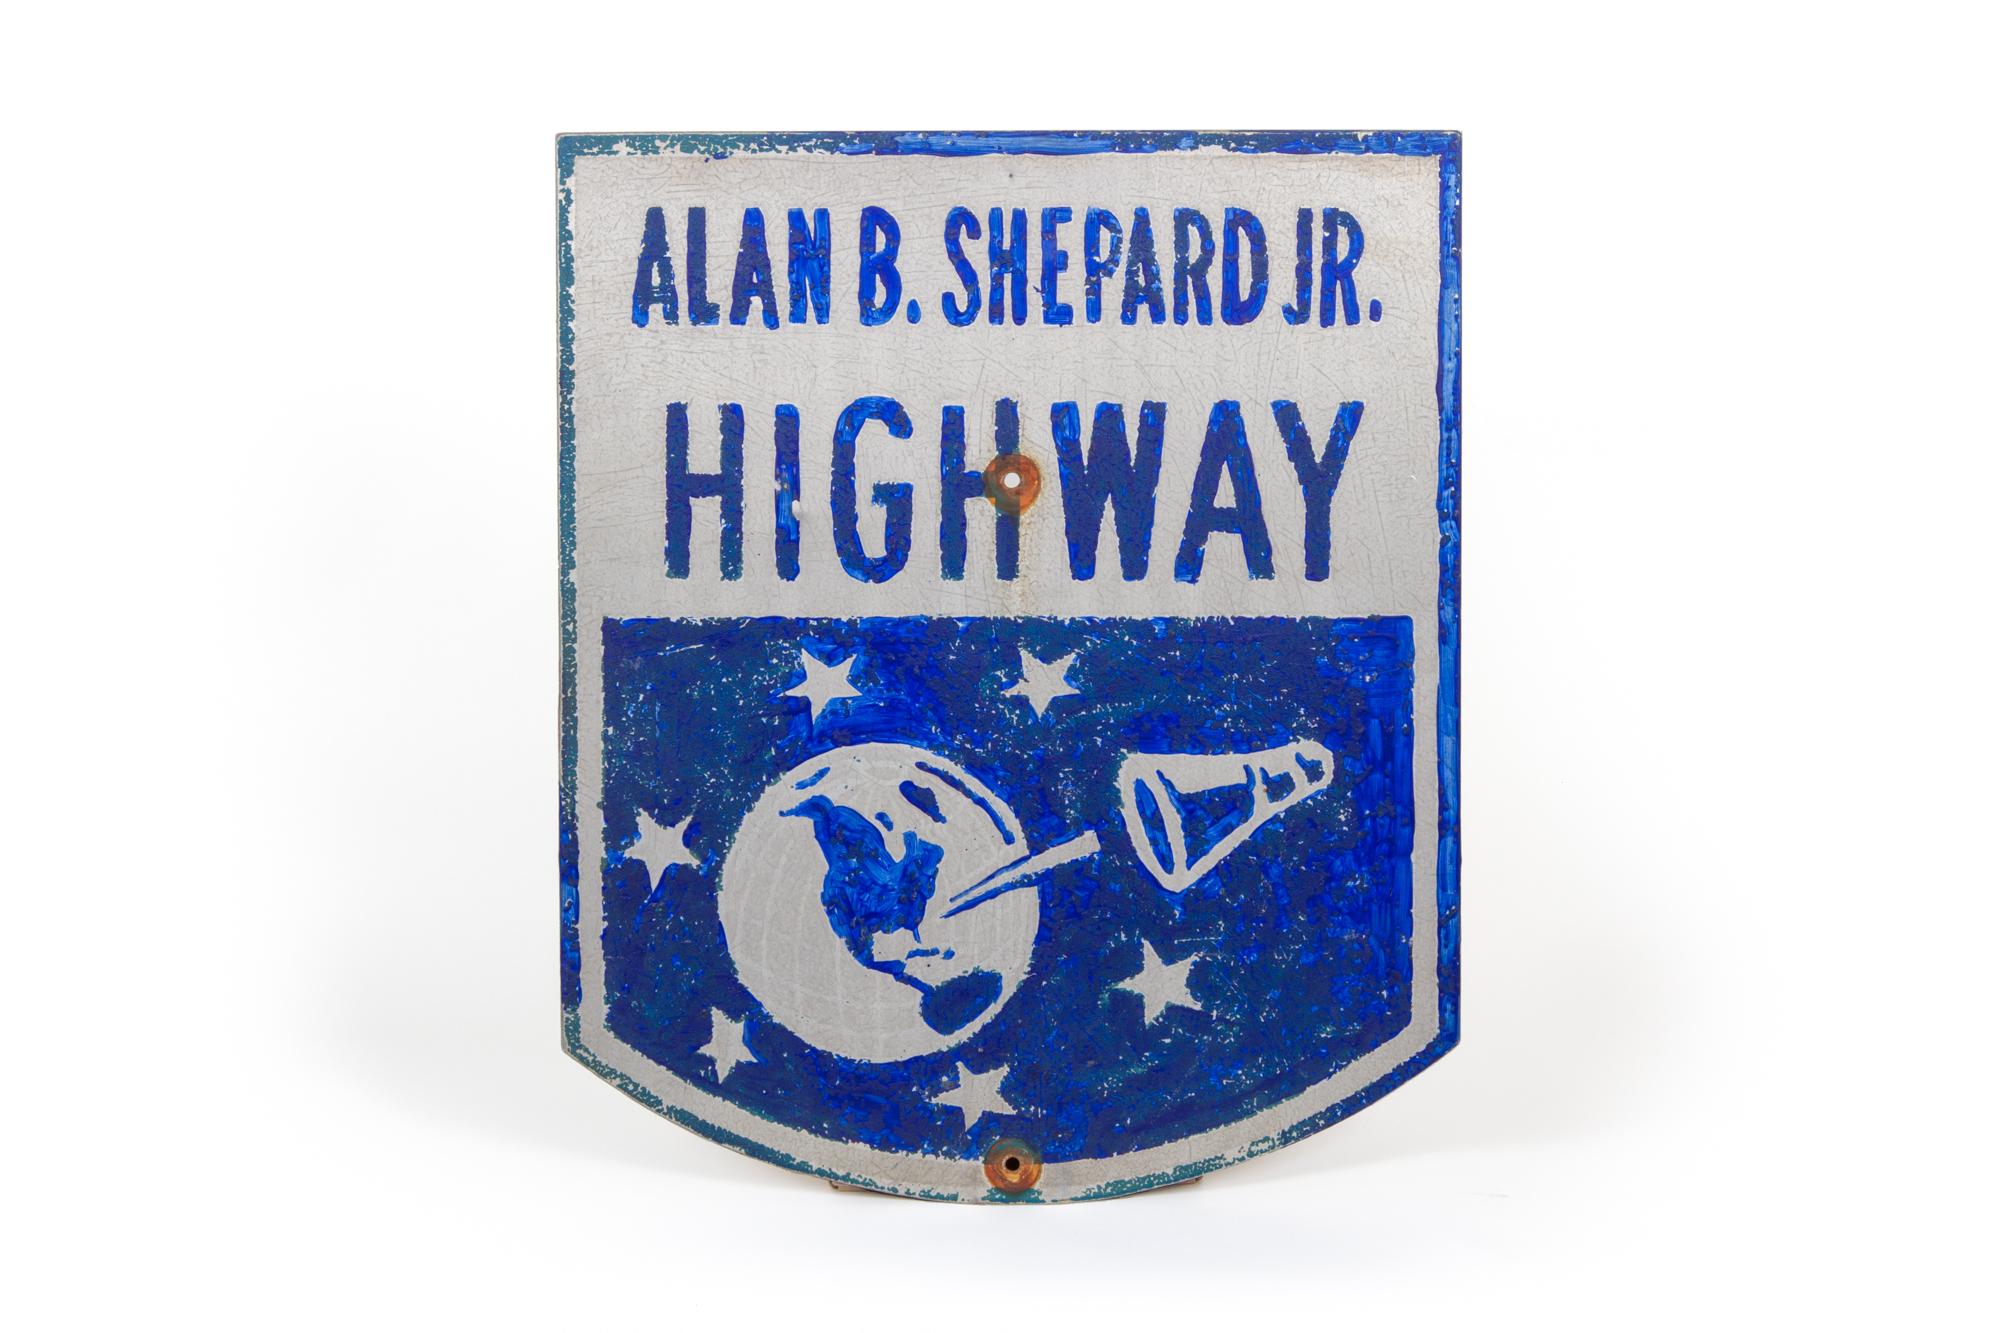 "Road Sign – ""Alan B. Shepard Jr. Highway"" (Derry, New Hampshire 1961)"